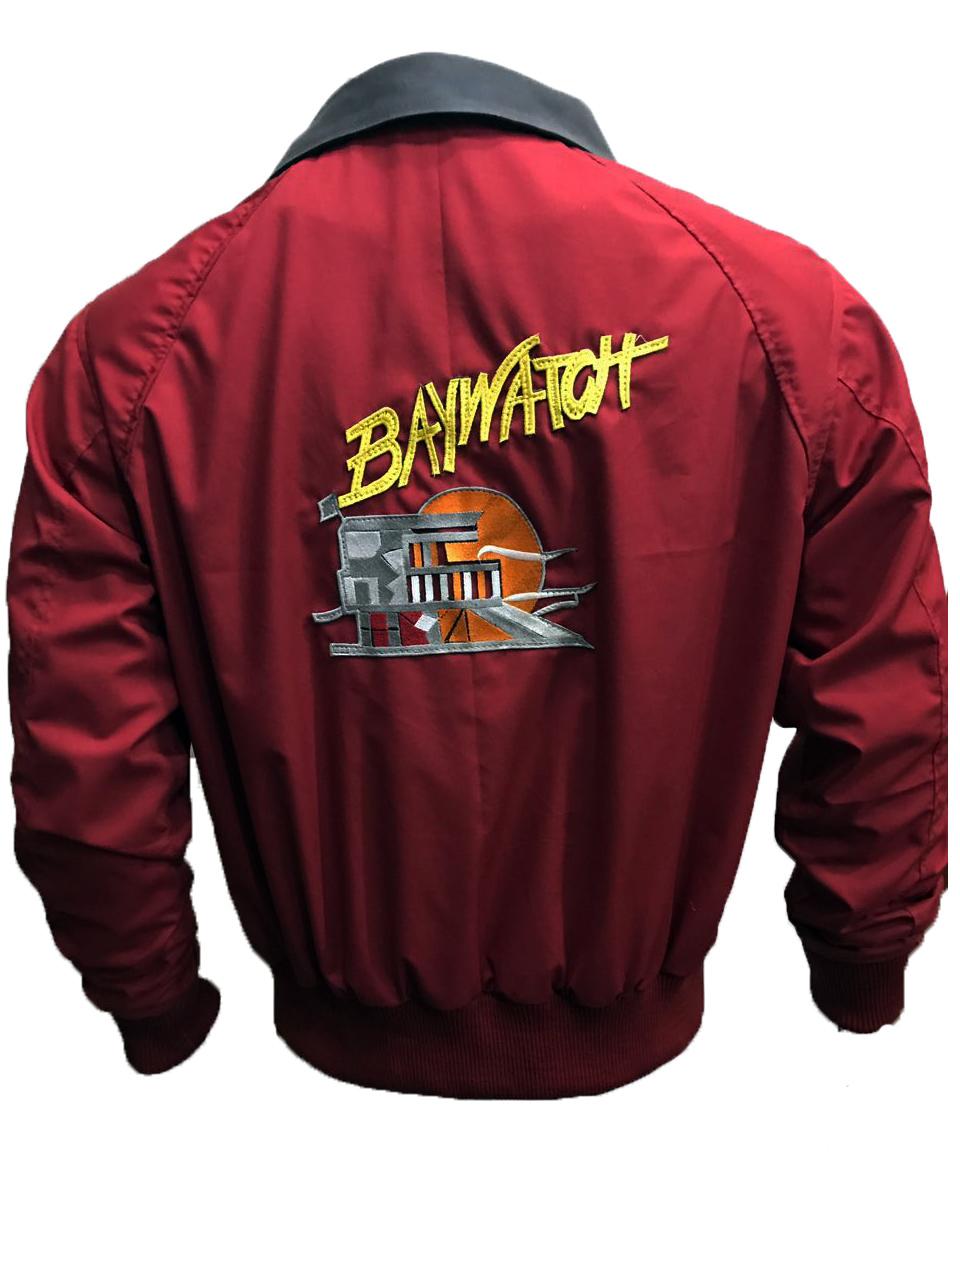 baywatch (1)